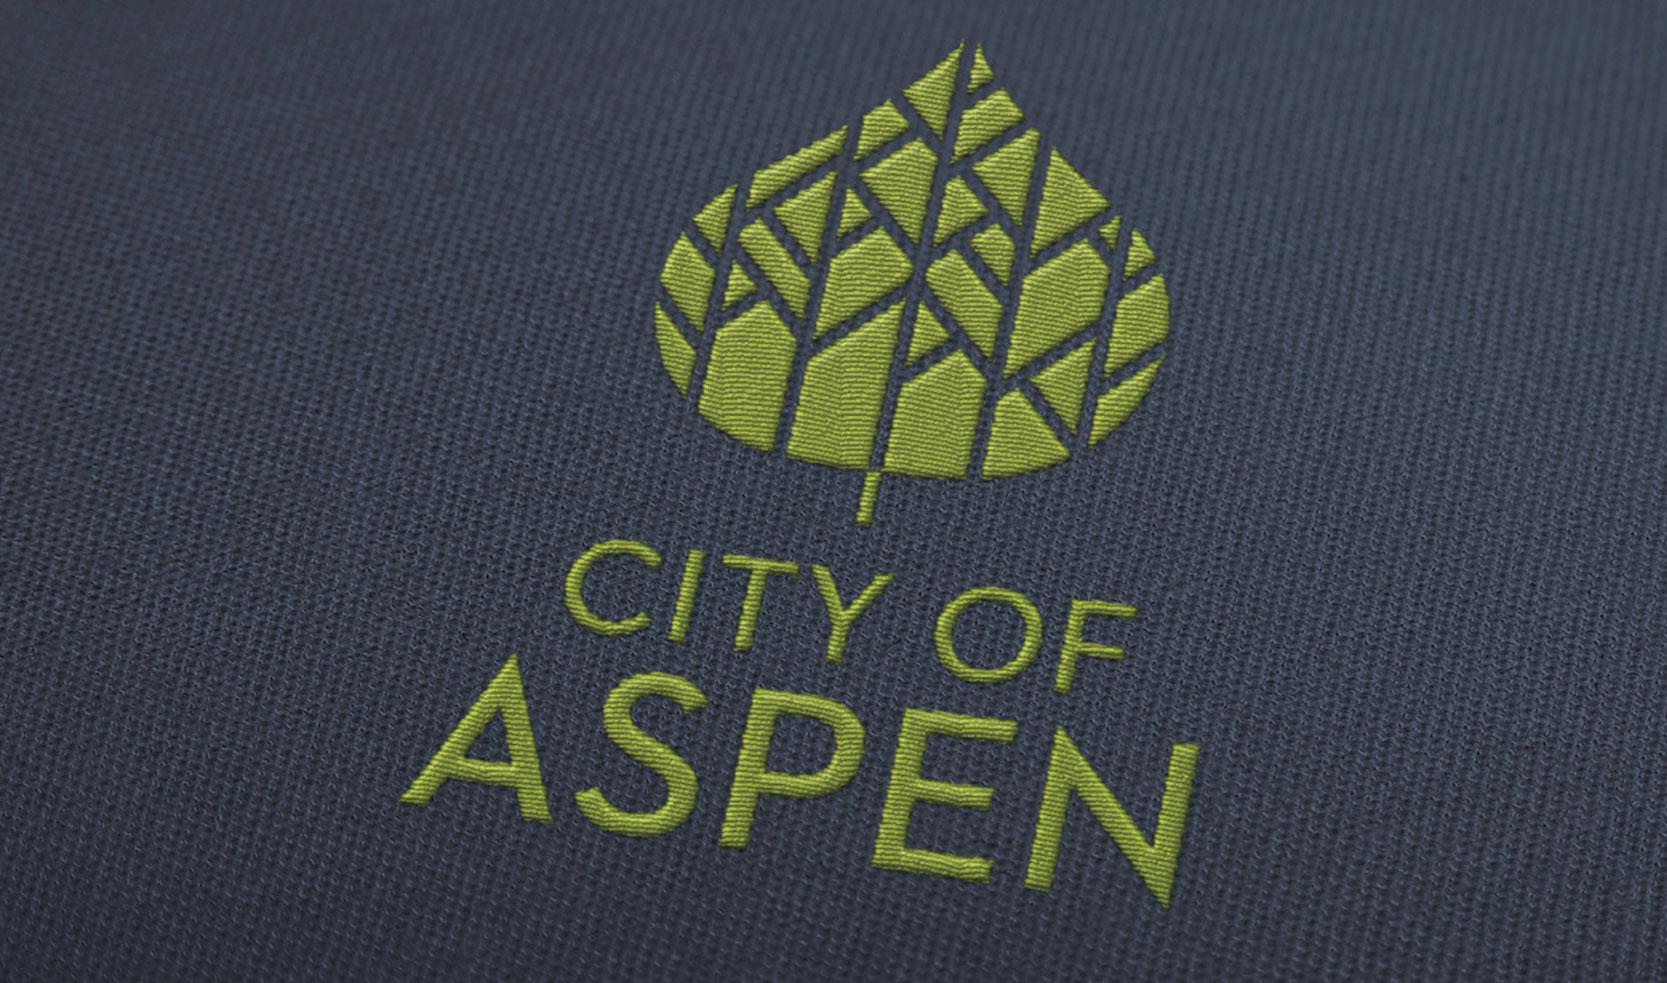 CityofAspen-3.jpg